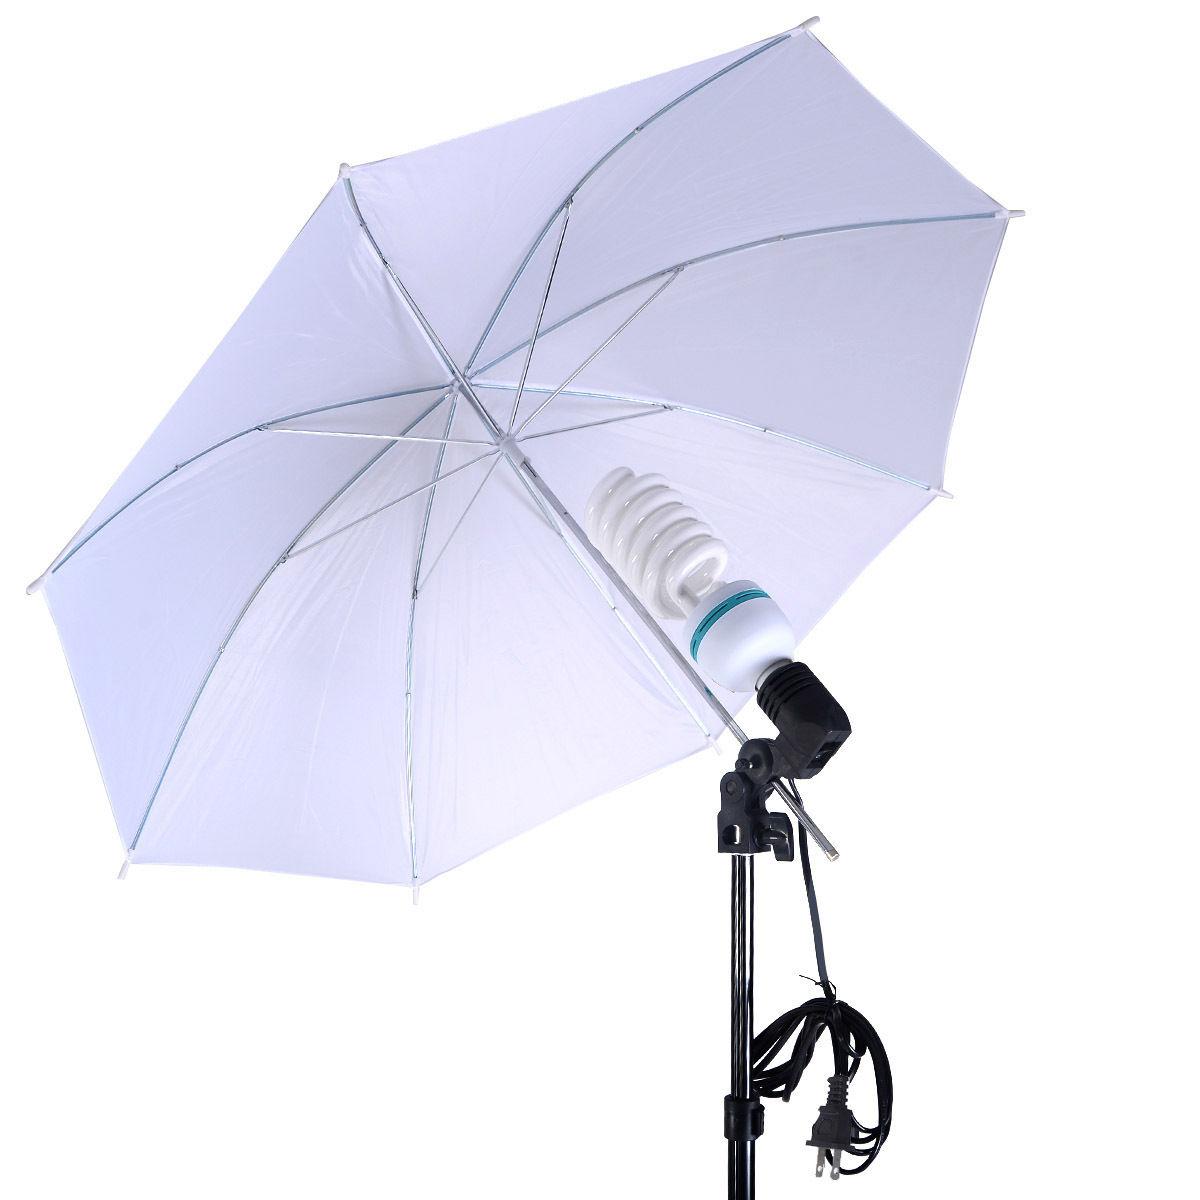 4 x 33'' Photo Studio Fluorescent Lighting Umbrella